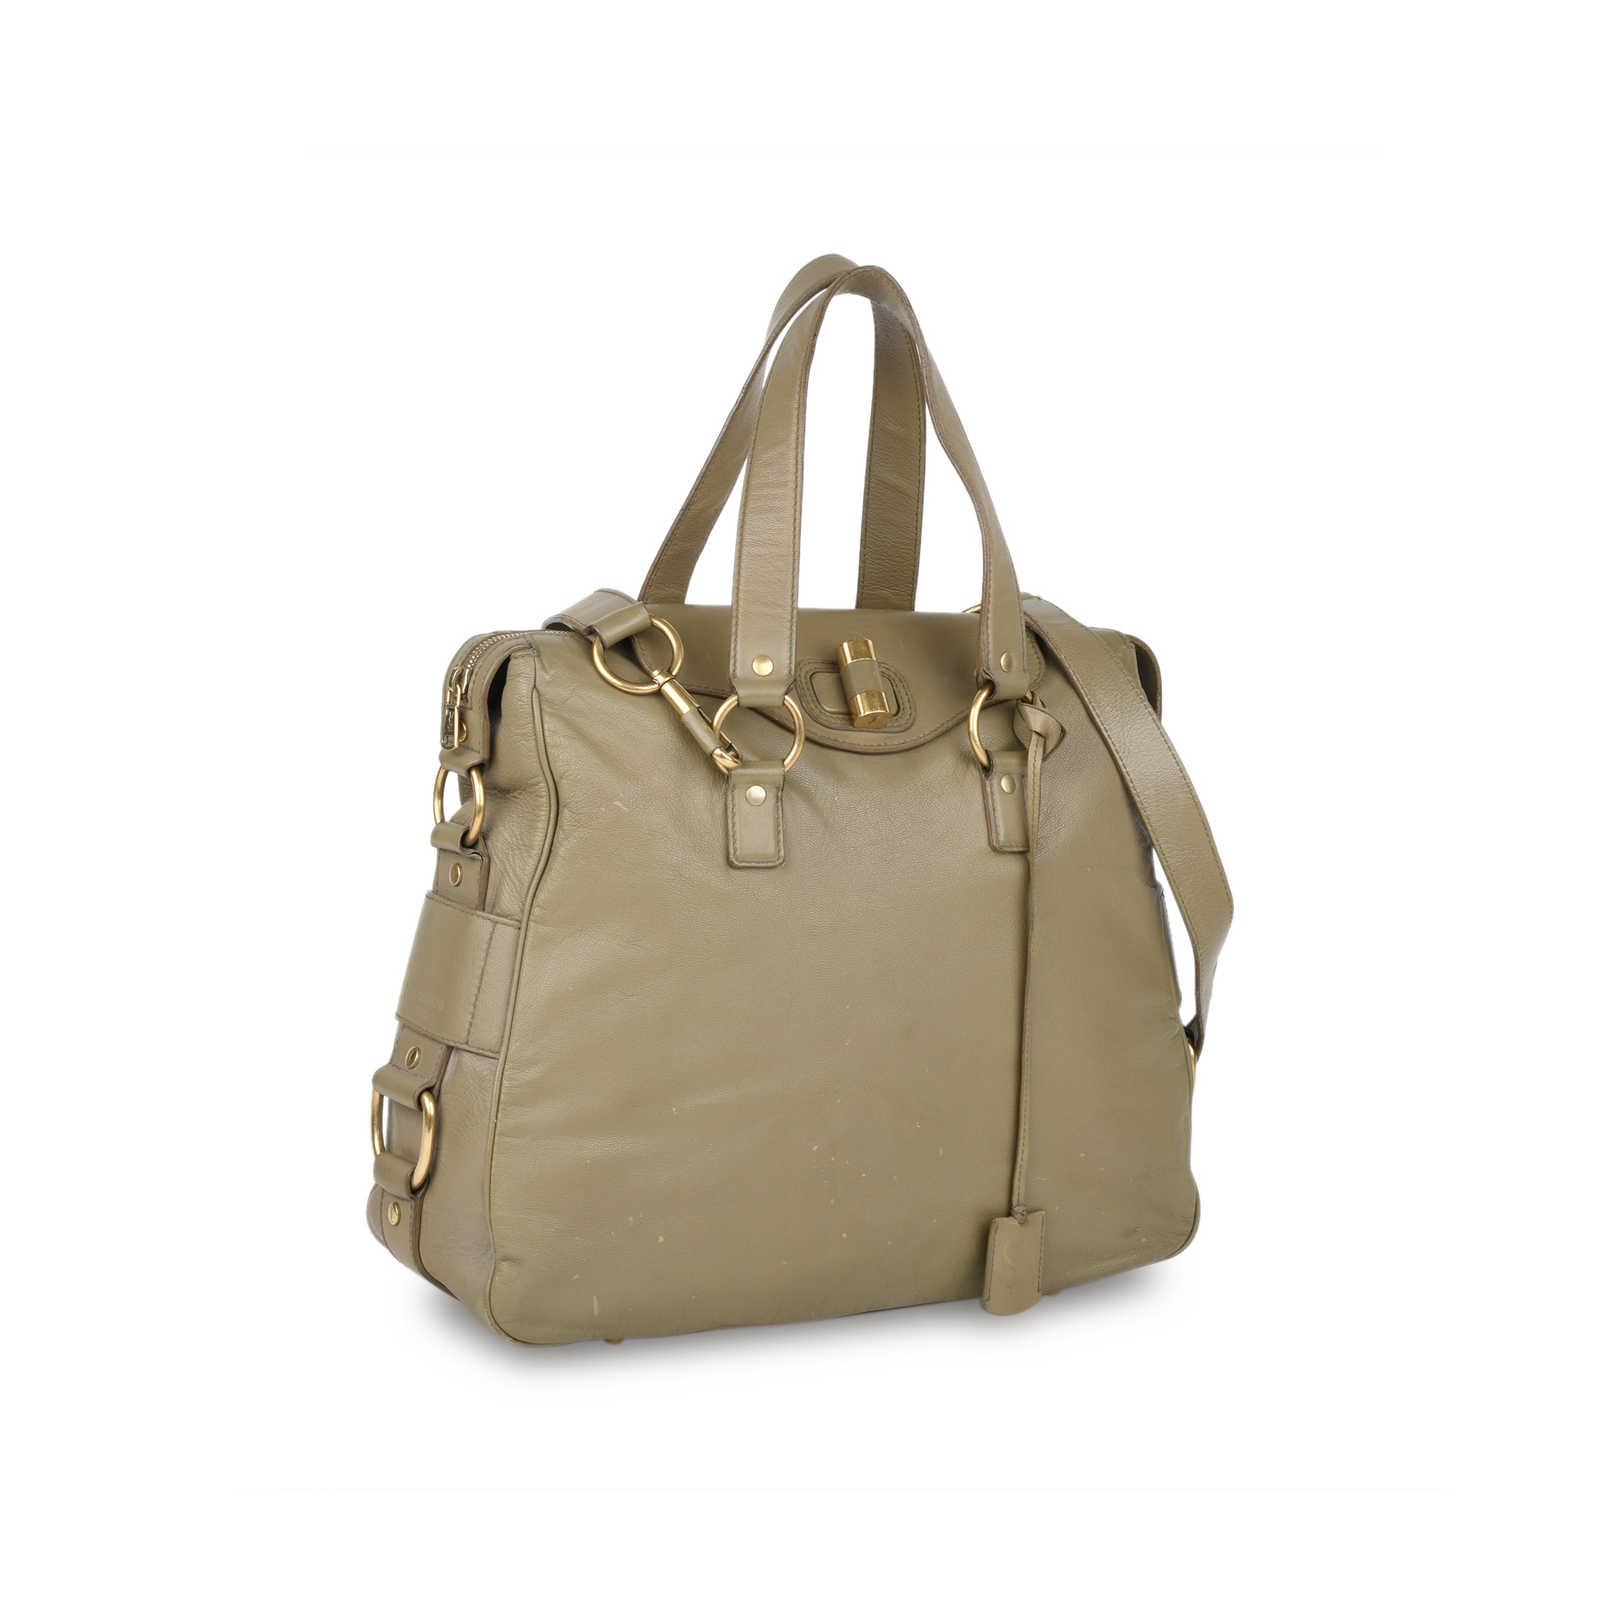 42ce81e1aaf ... Authentic Second Hand Yves Saint Laurent Muse Messenger Bag  (PSS-420-00067) ...